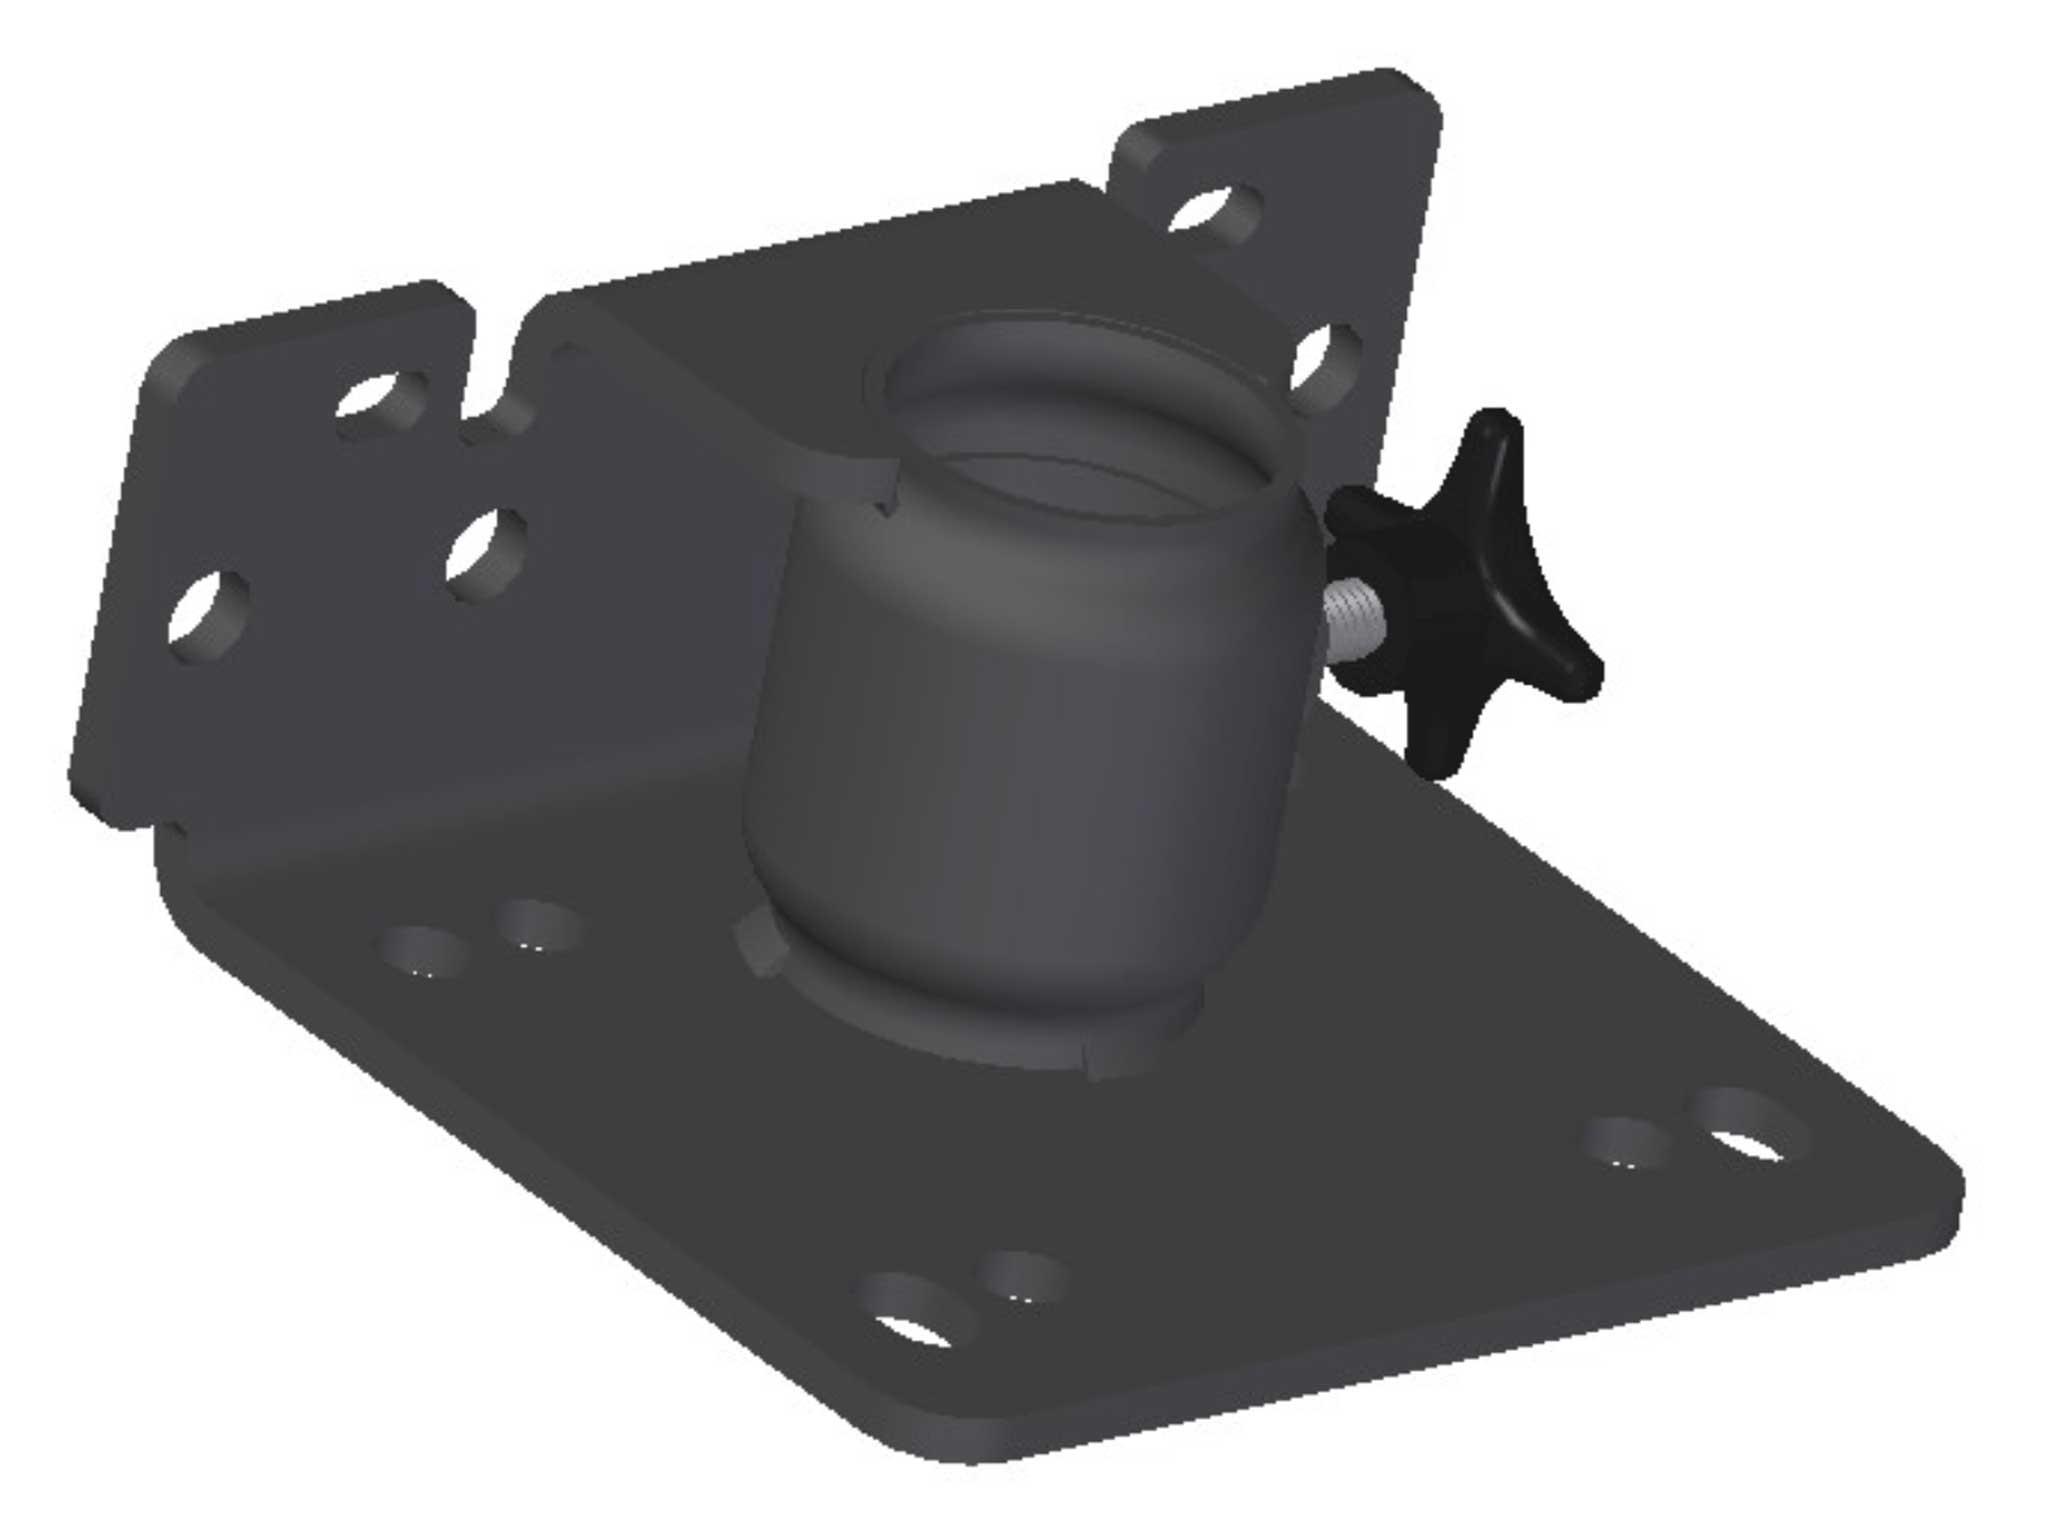 Handlebar /Floor brake attachment - US